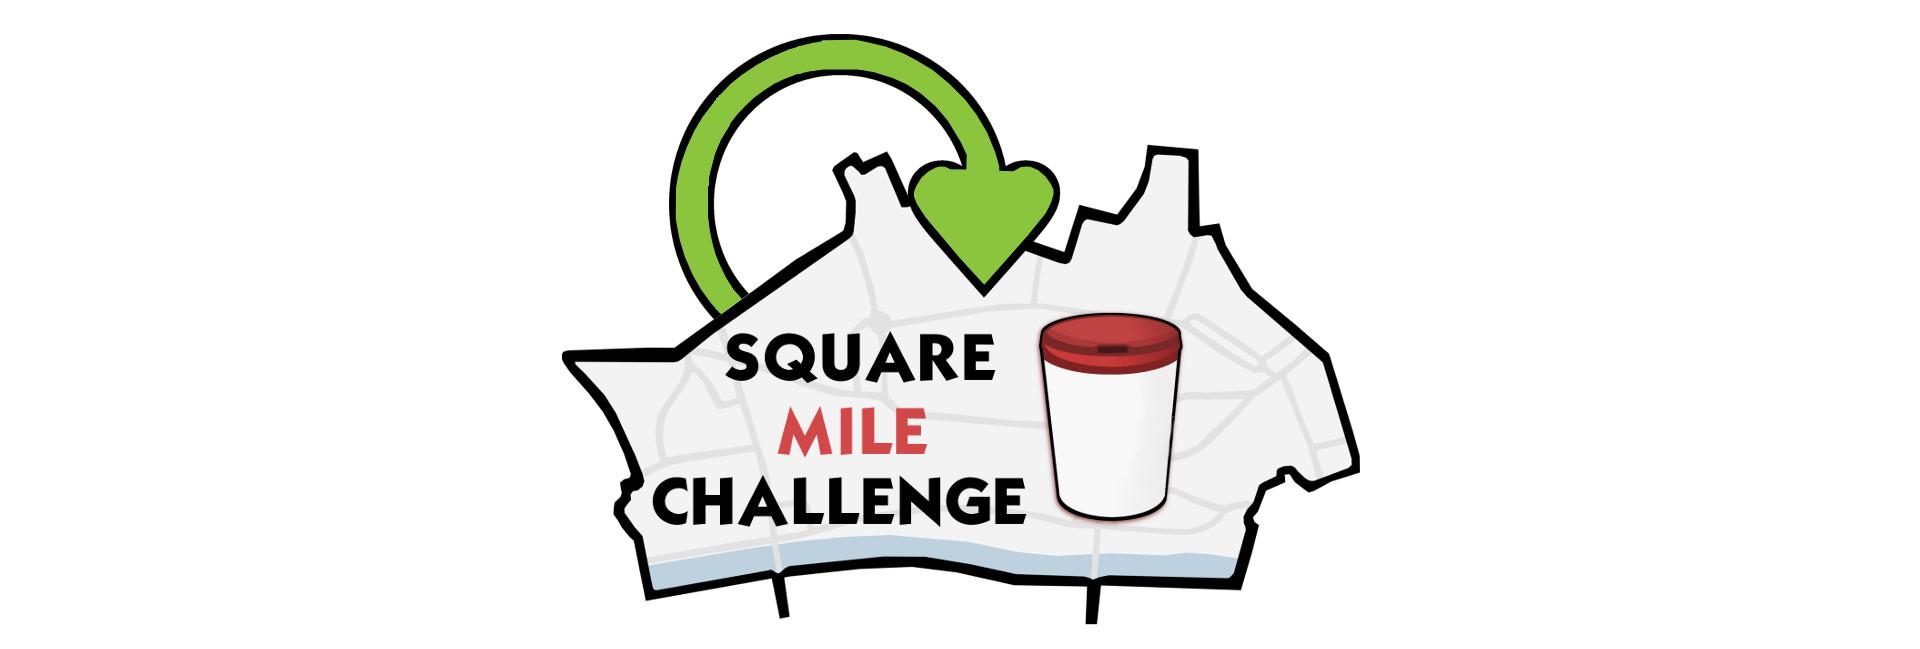 Square Mile Challenge